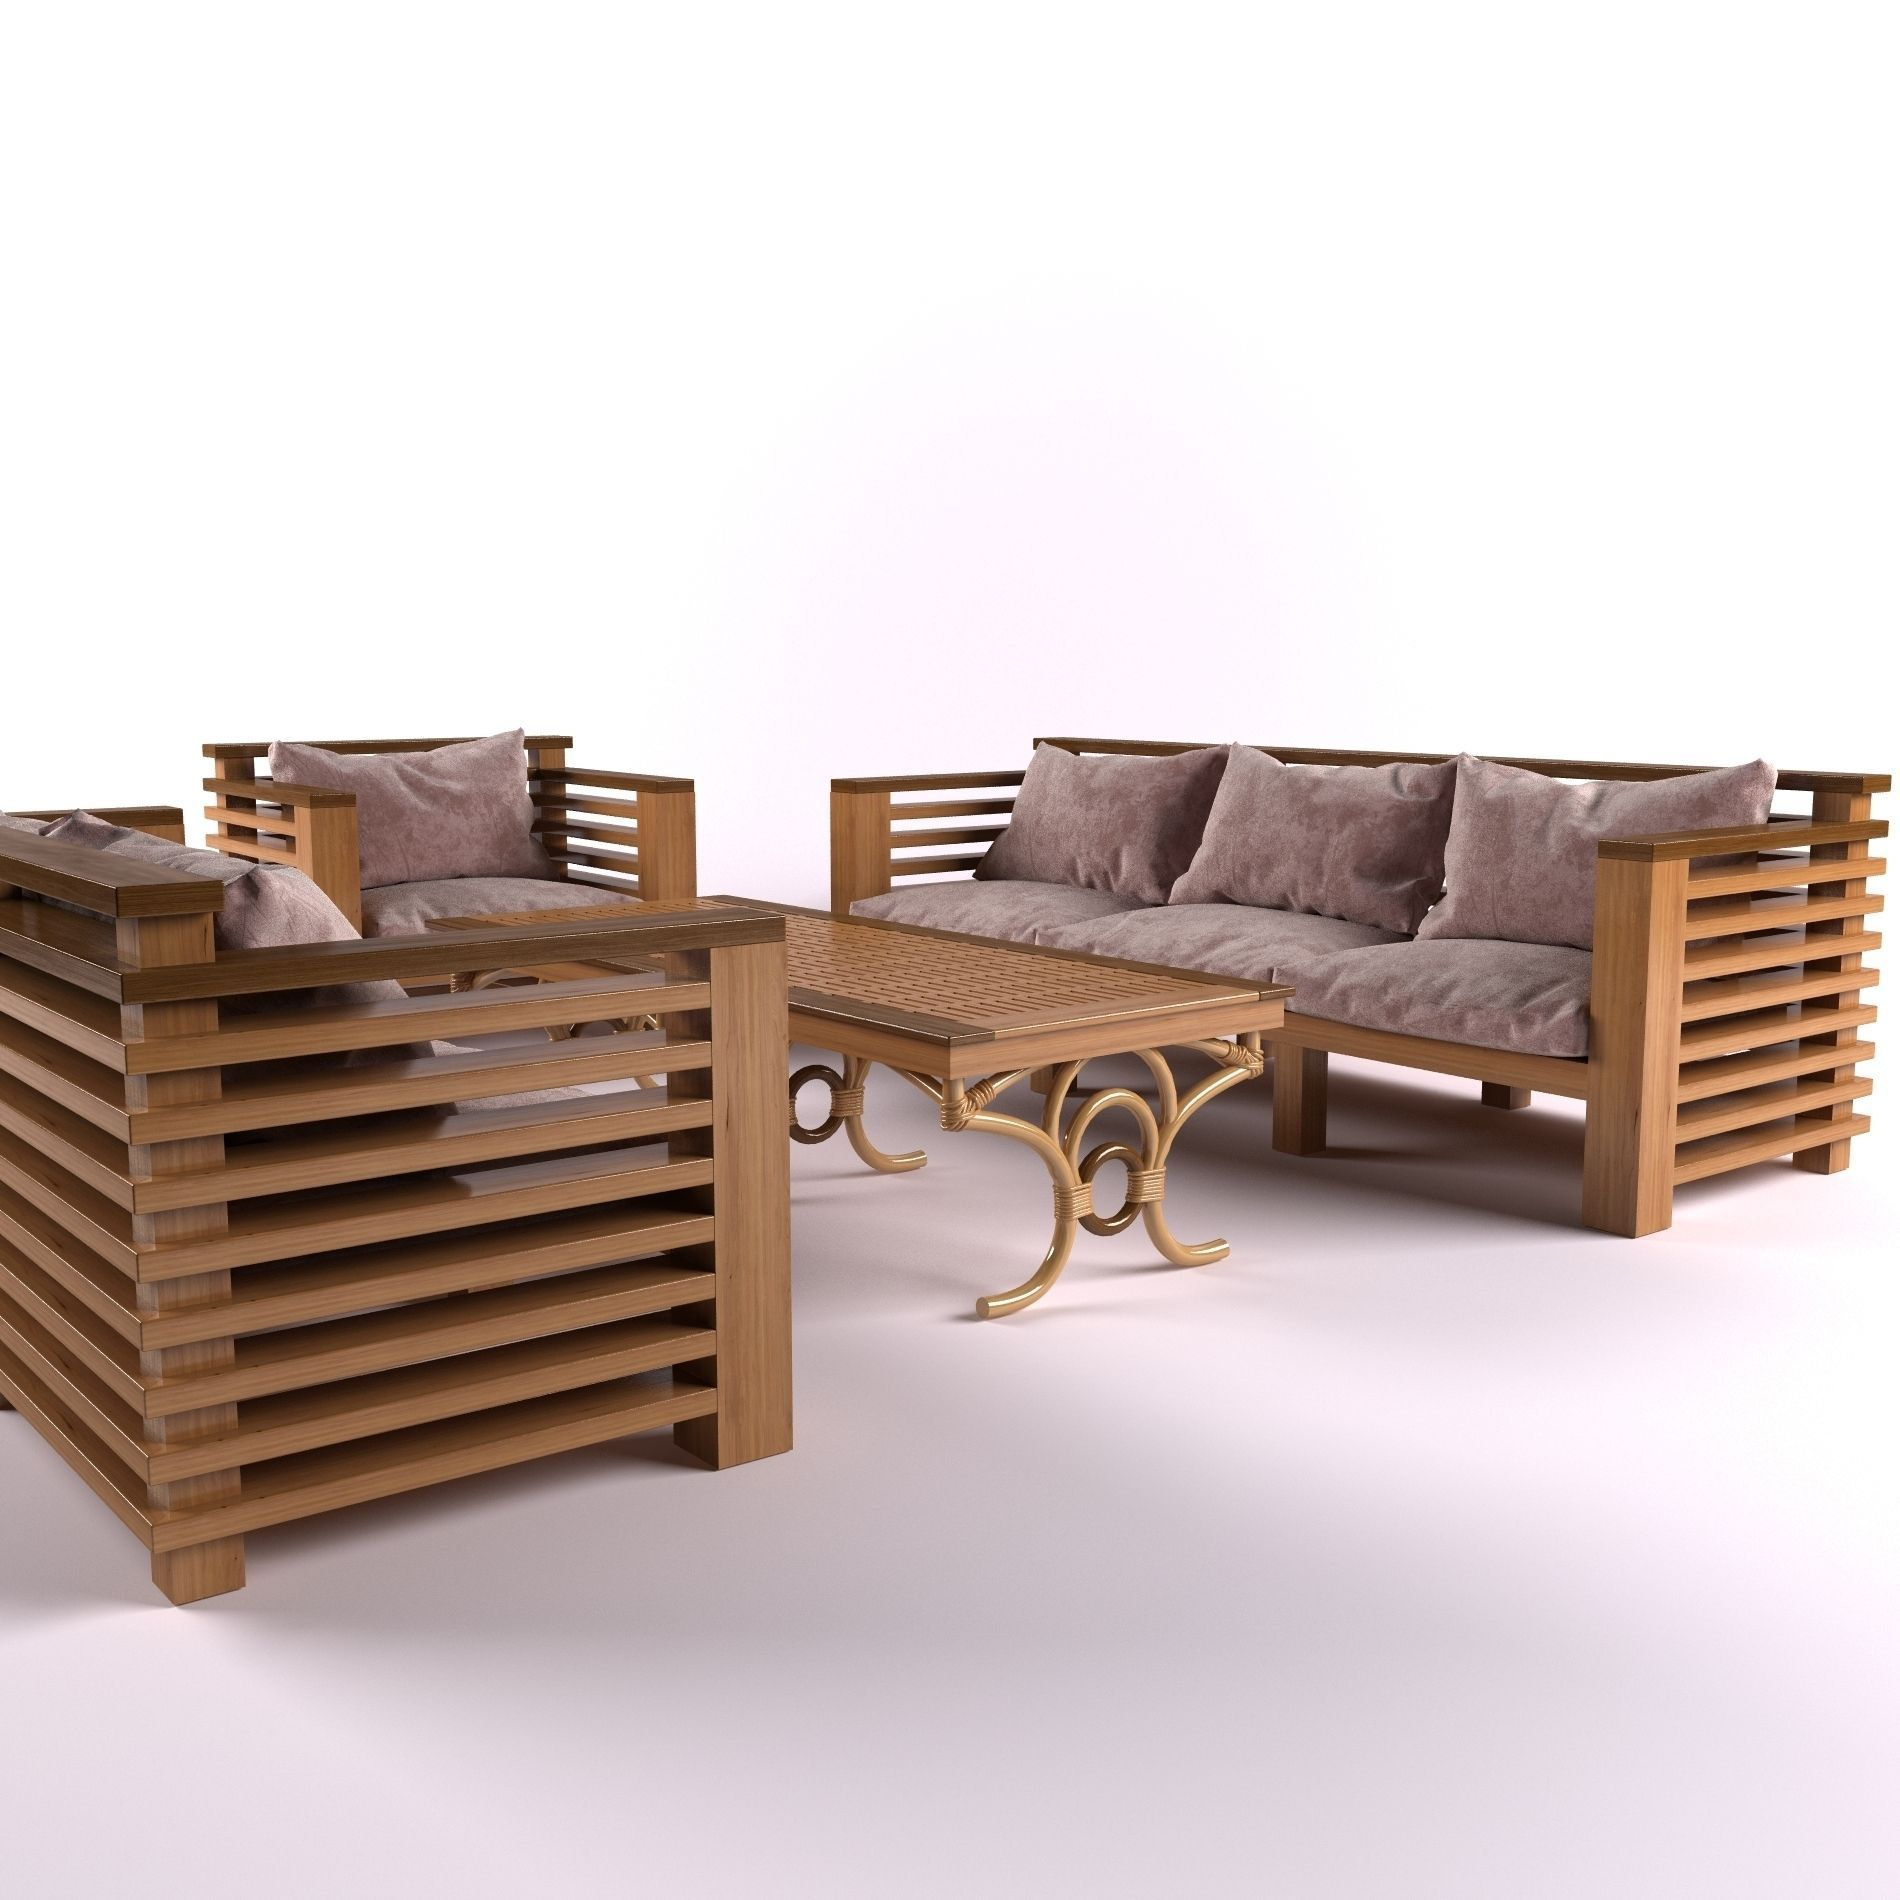 garden furniture 3d model max obj mtl 4 - Garden Furniture 3d Model